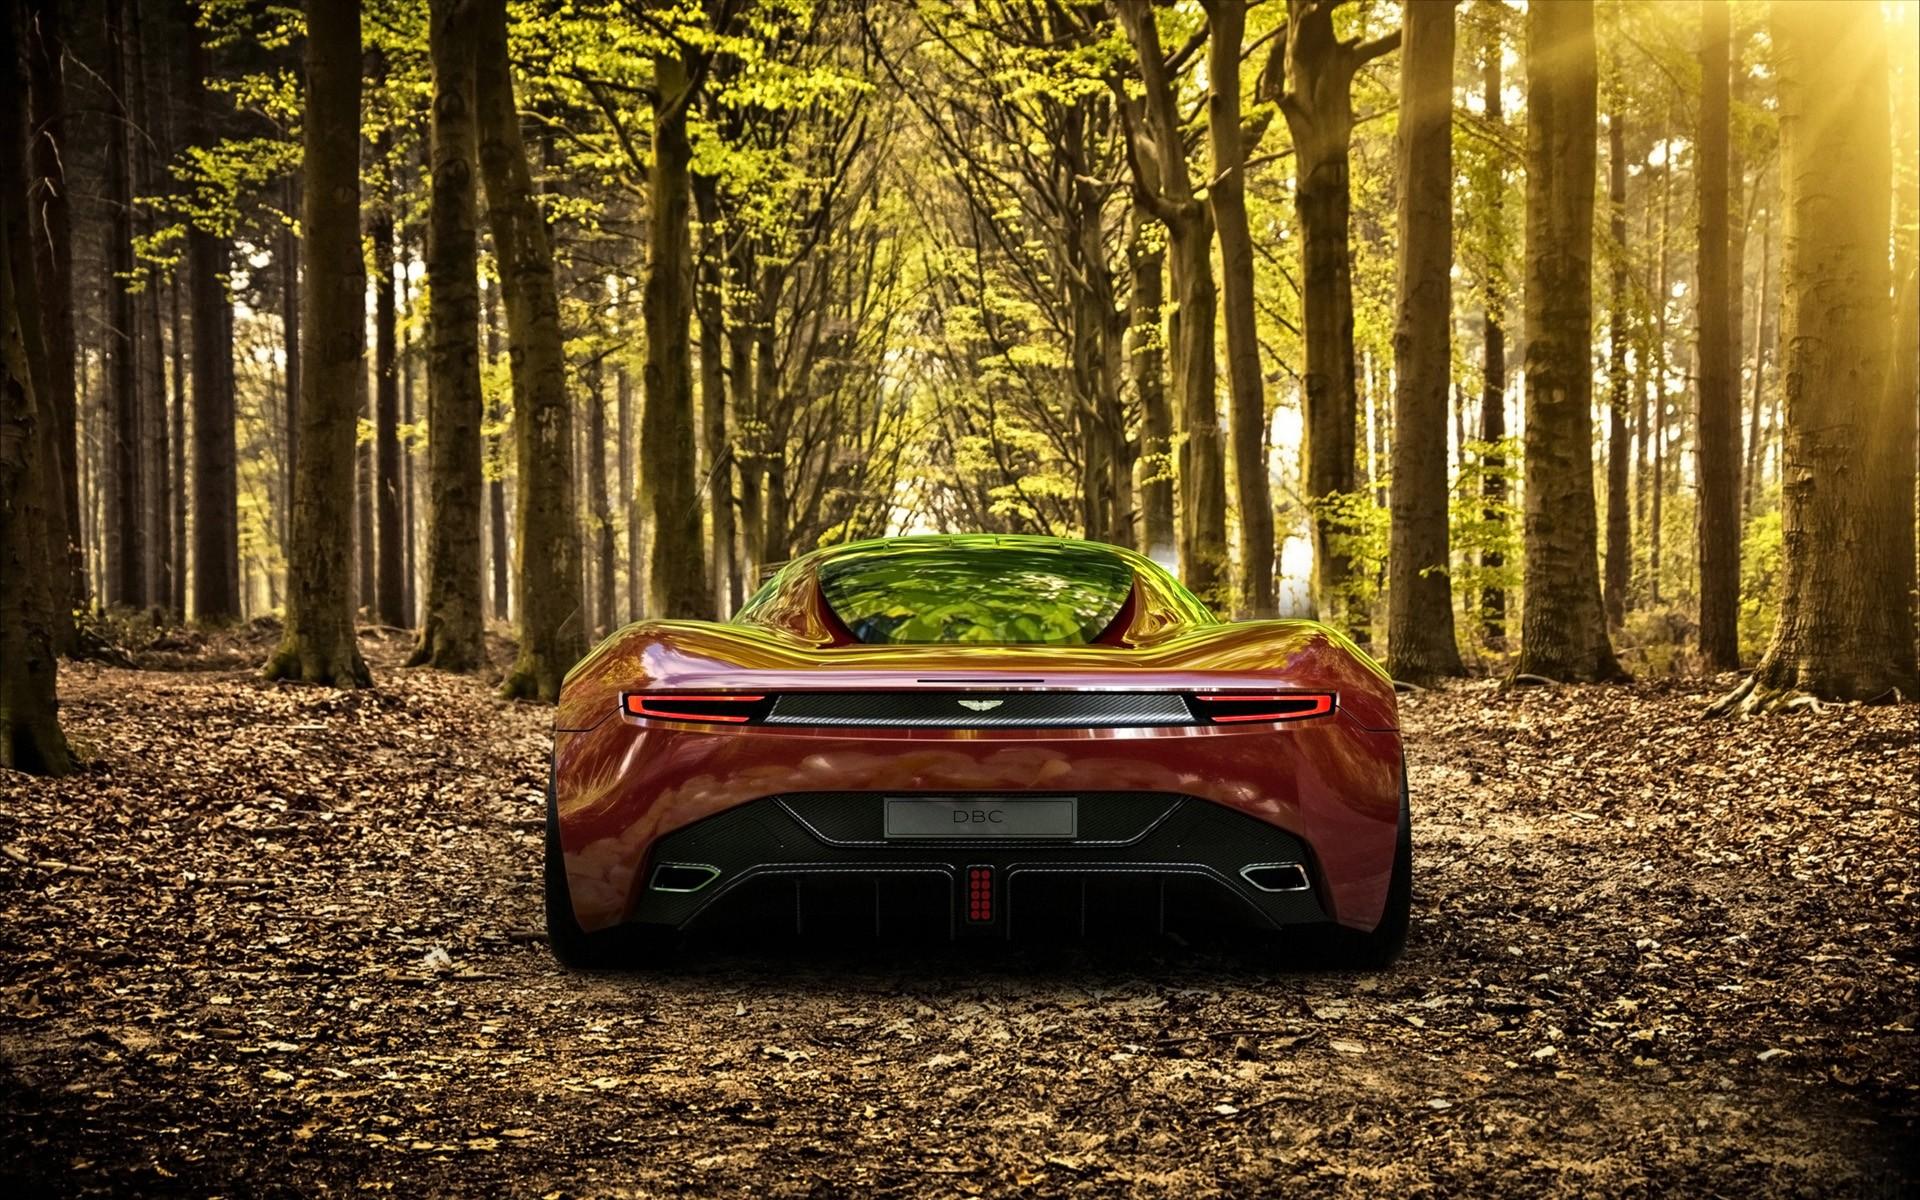 Aston Martin Dbc Aston Martin Wallpaper Resolution 1920x1200 Id 45724 Wallha Com